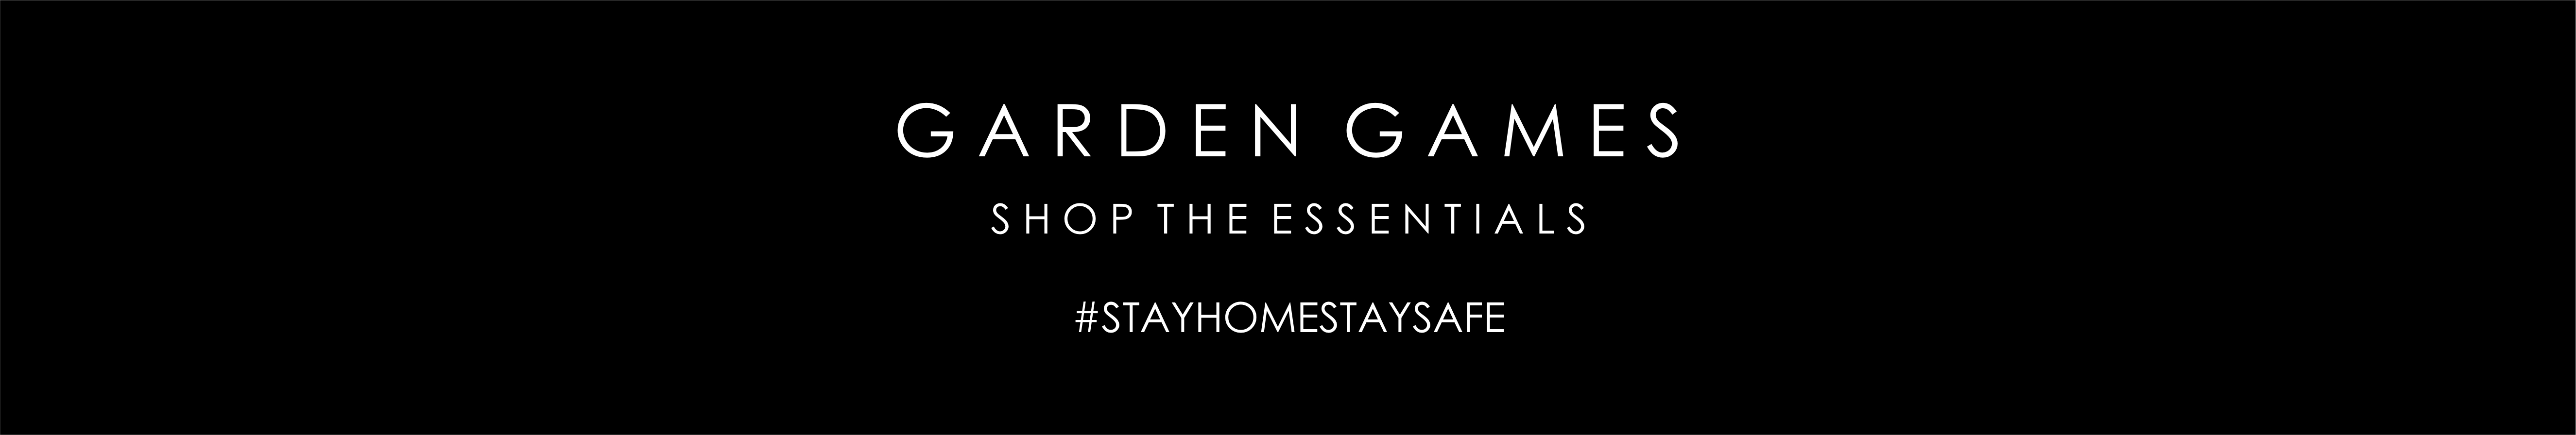 garden-games-banner.jpg